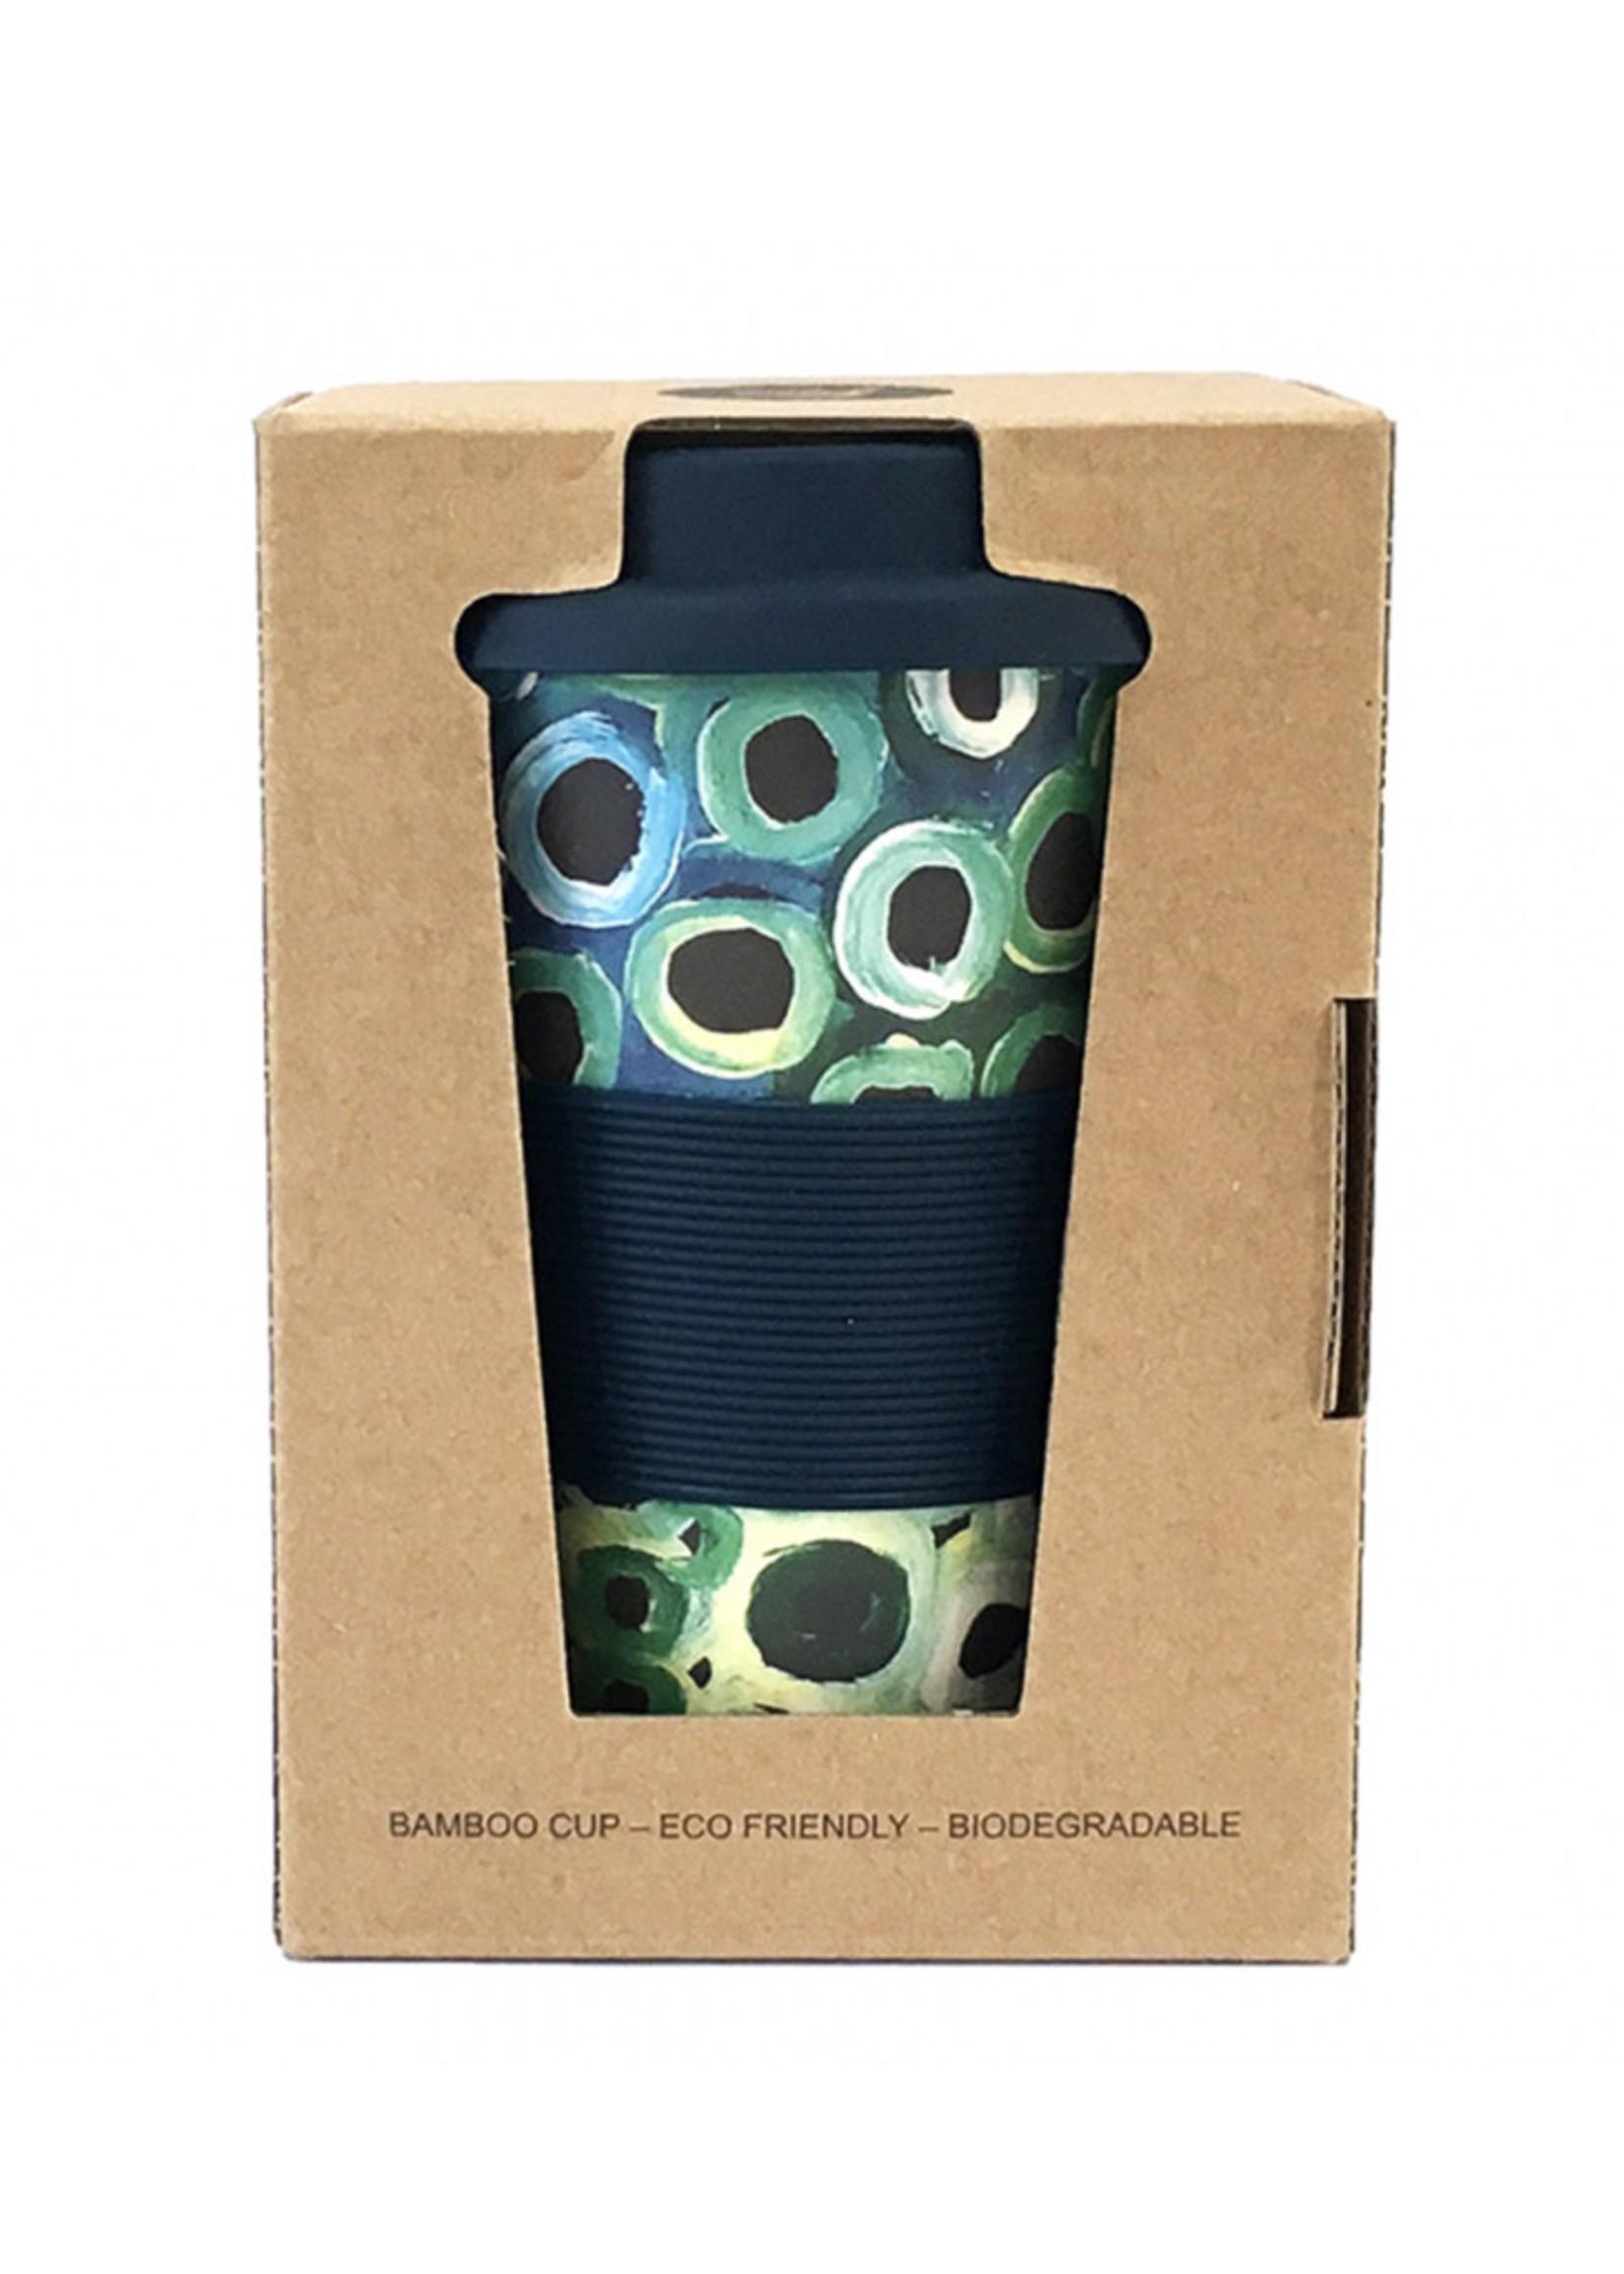 Utopia Bamboo Eco Coffee Cup 172 - Lena Pwerle